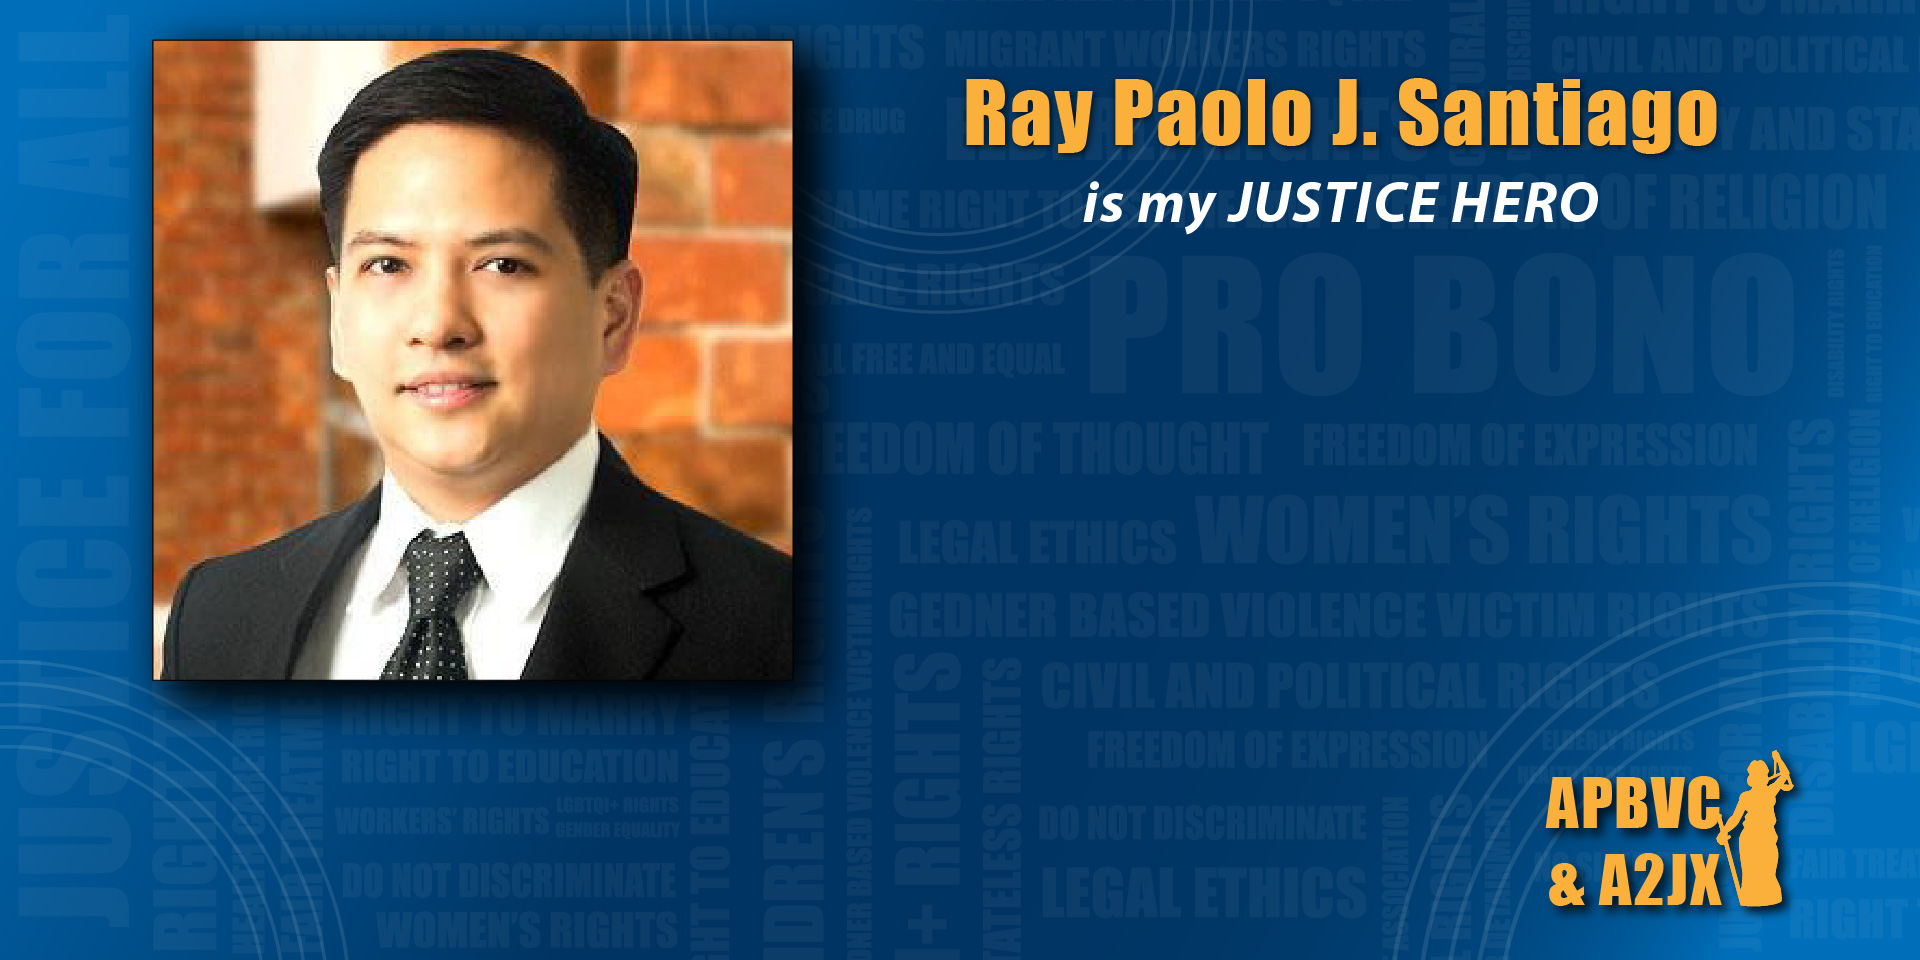 Ray Paolo J. Santiago